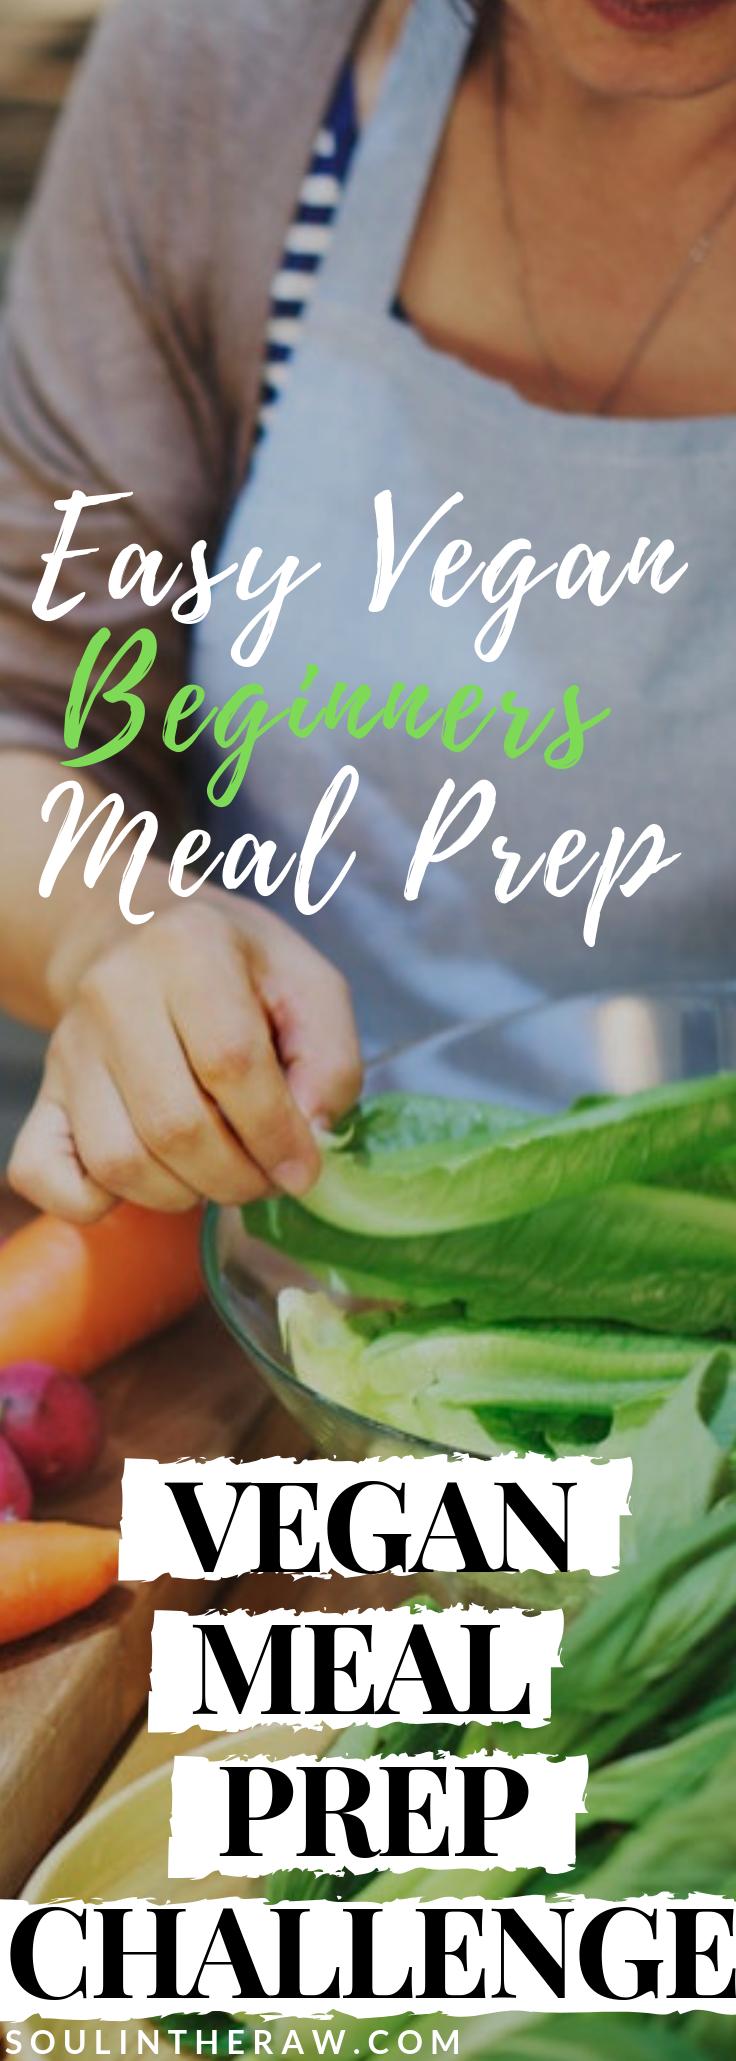 Vegan Meal Prep Challenge: Easy Meal Prep for Beginners images